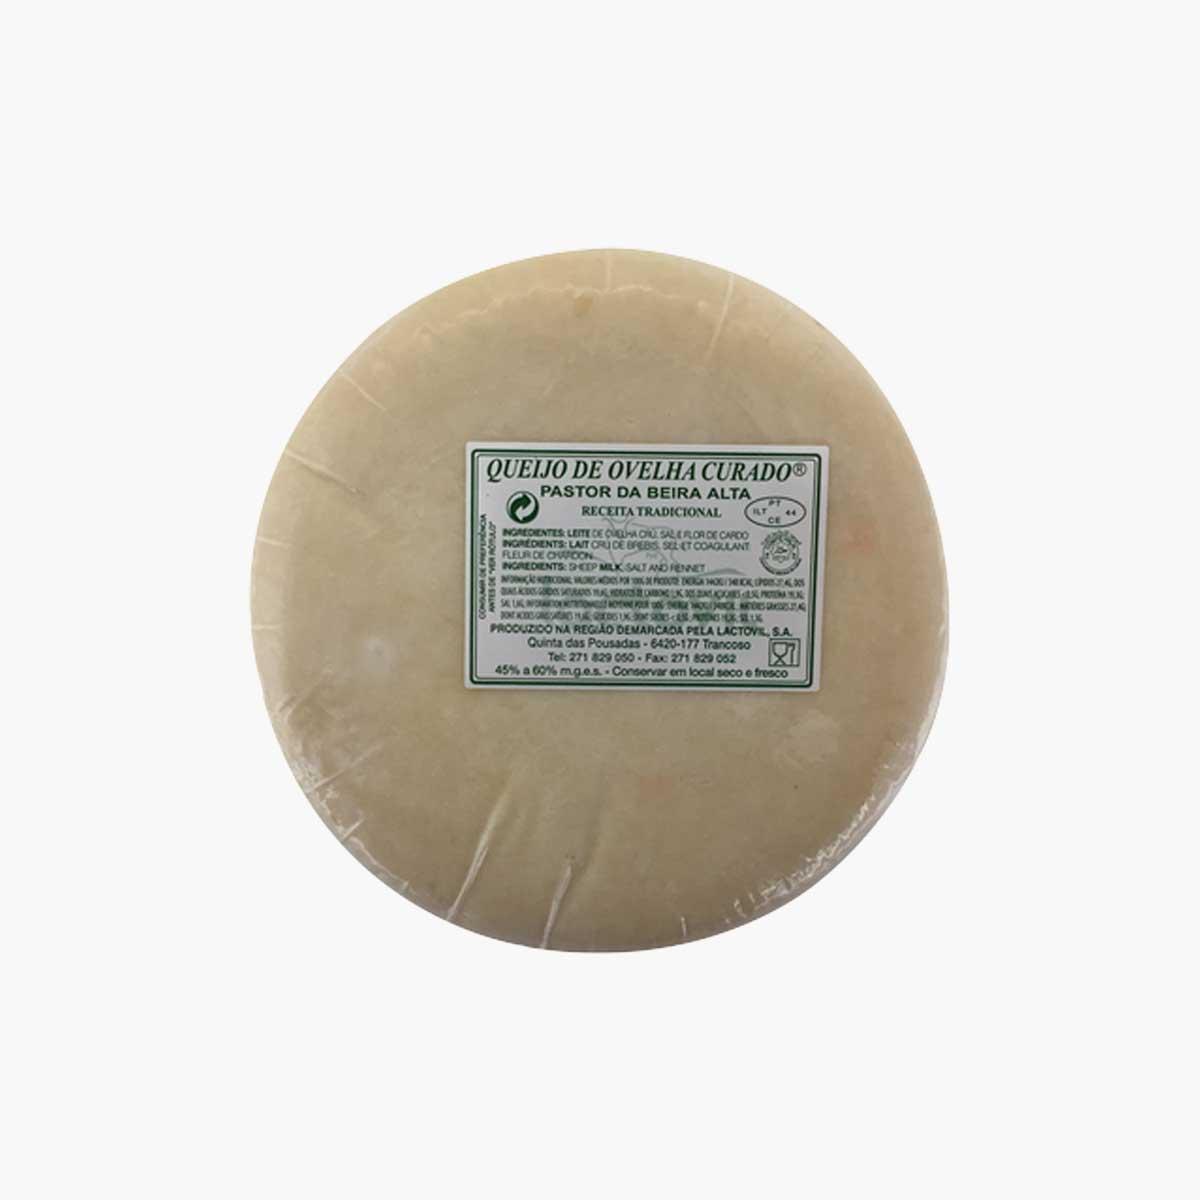 Pastor da Beira Alta Cured Sheep Cheese